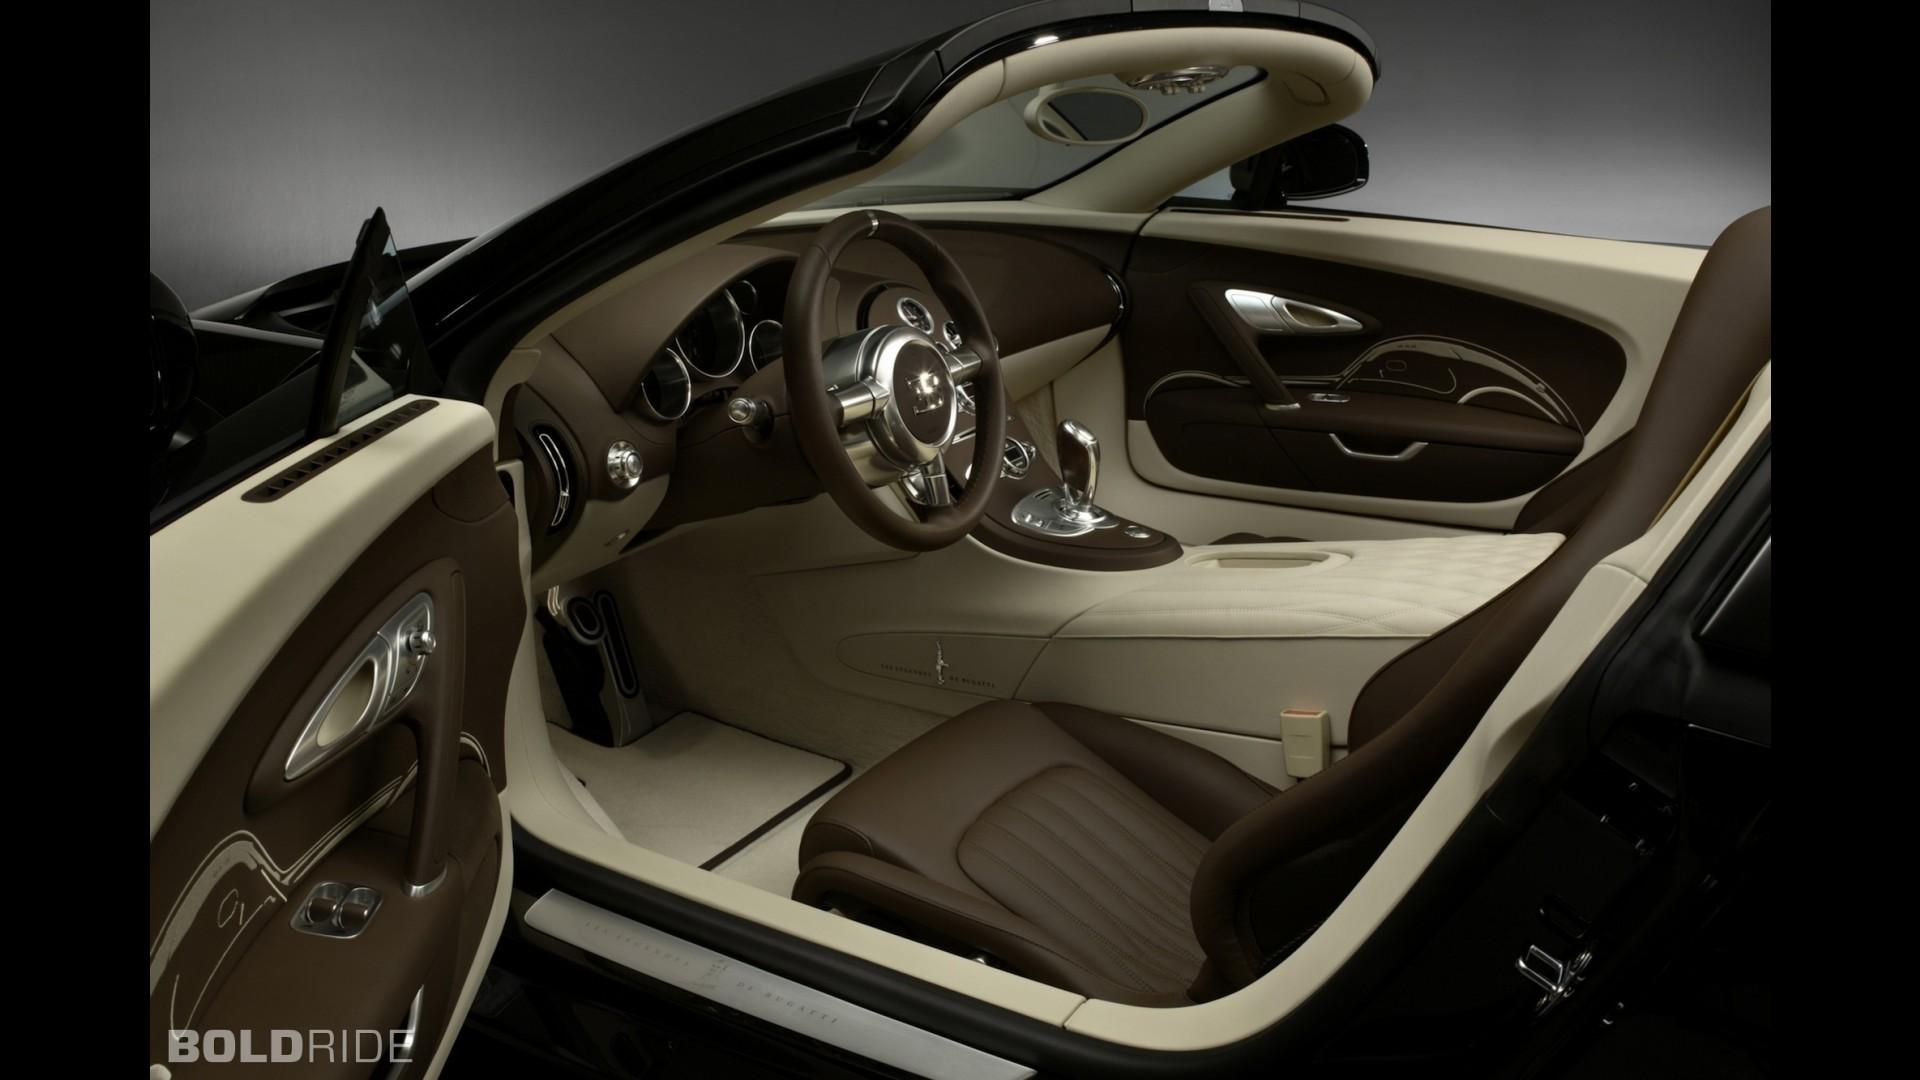 bugatti-veyron-grand-sport-vitesse-legend-jean-bugatti-special-edition Stunning Bugatti Veyron 16.4 Grand Sport Vitesse Interior Cars Trend